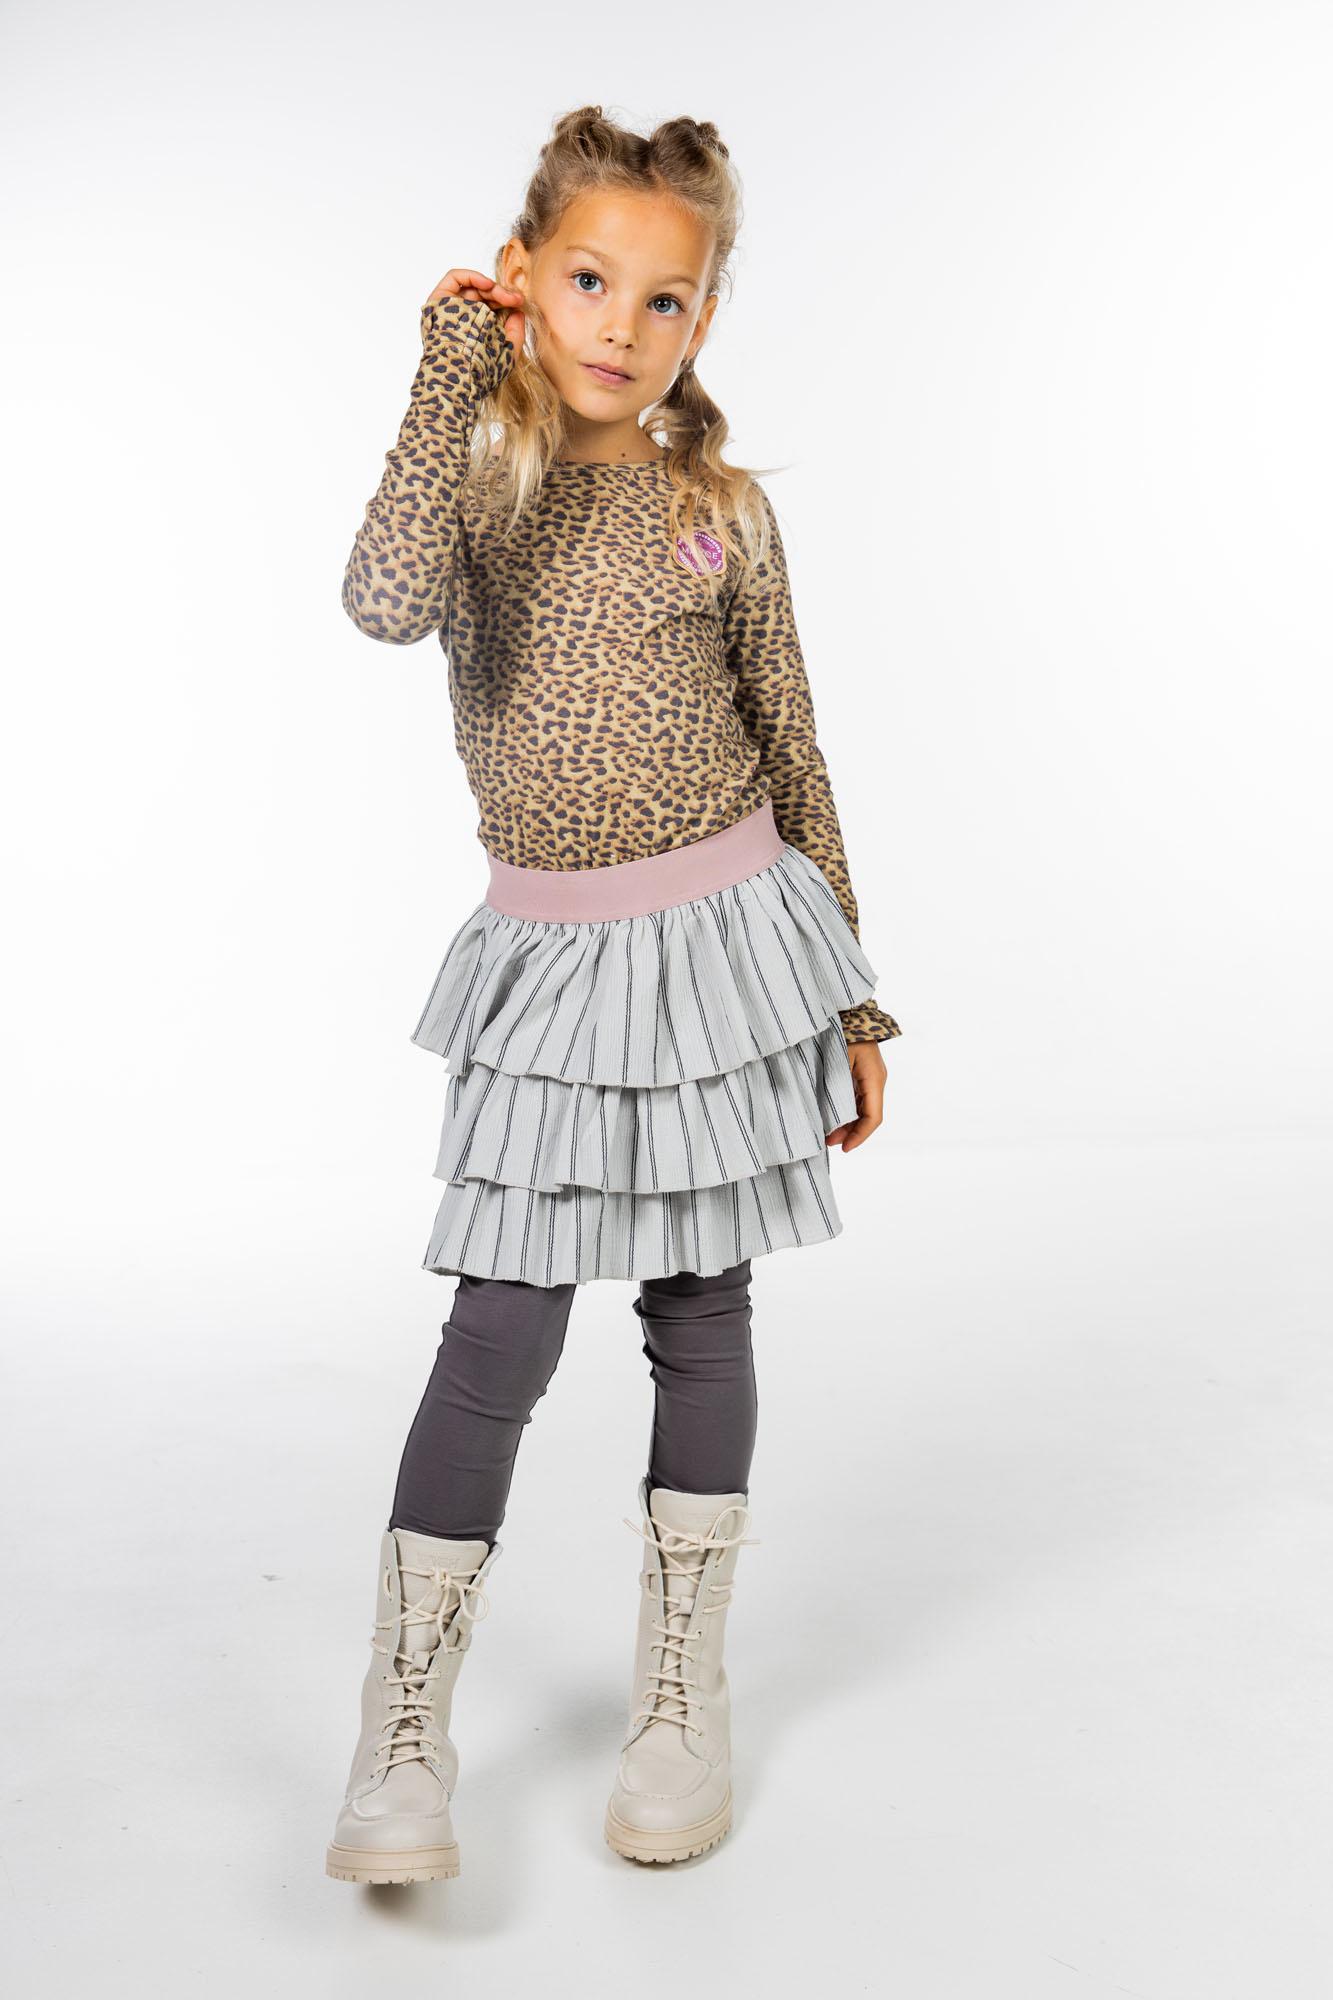 Mayce Girlslabel lookbook winter 2022-14